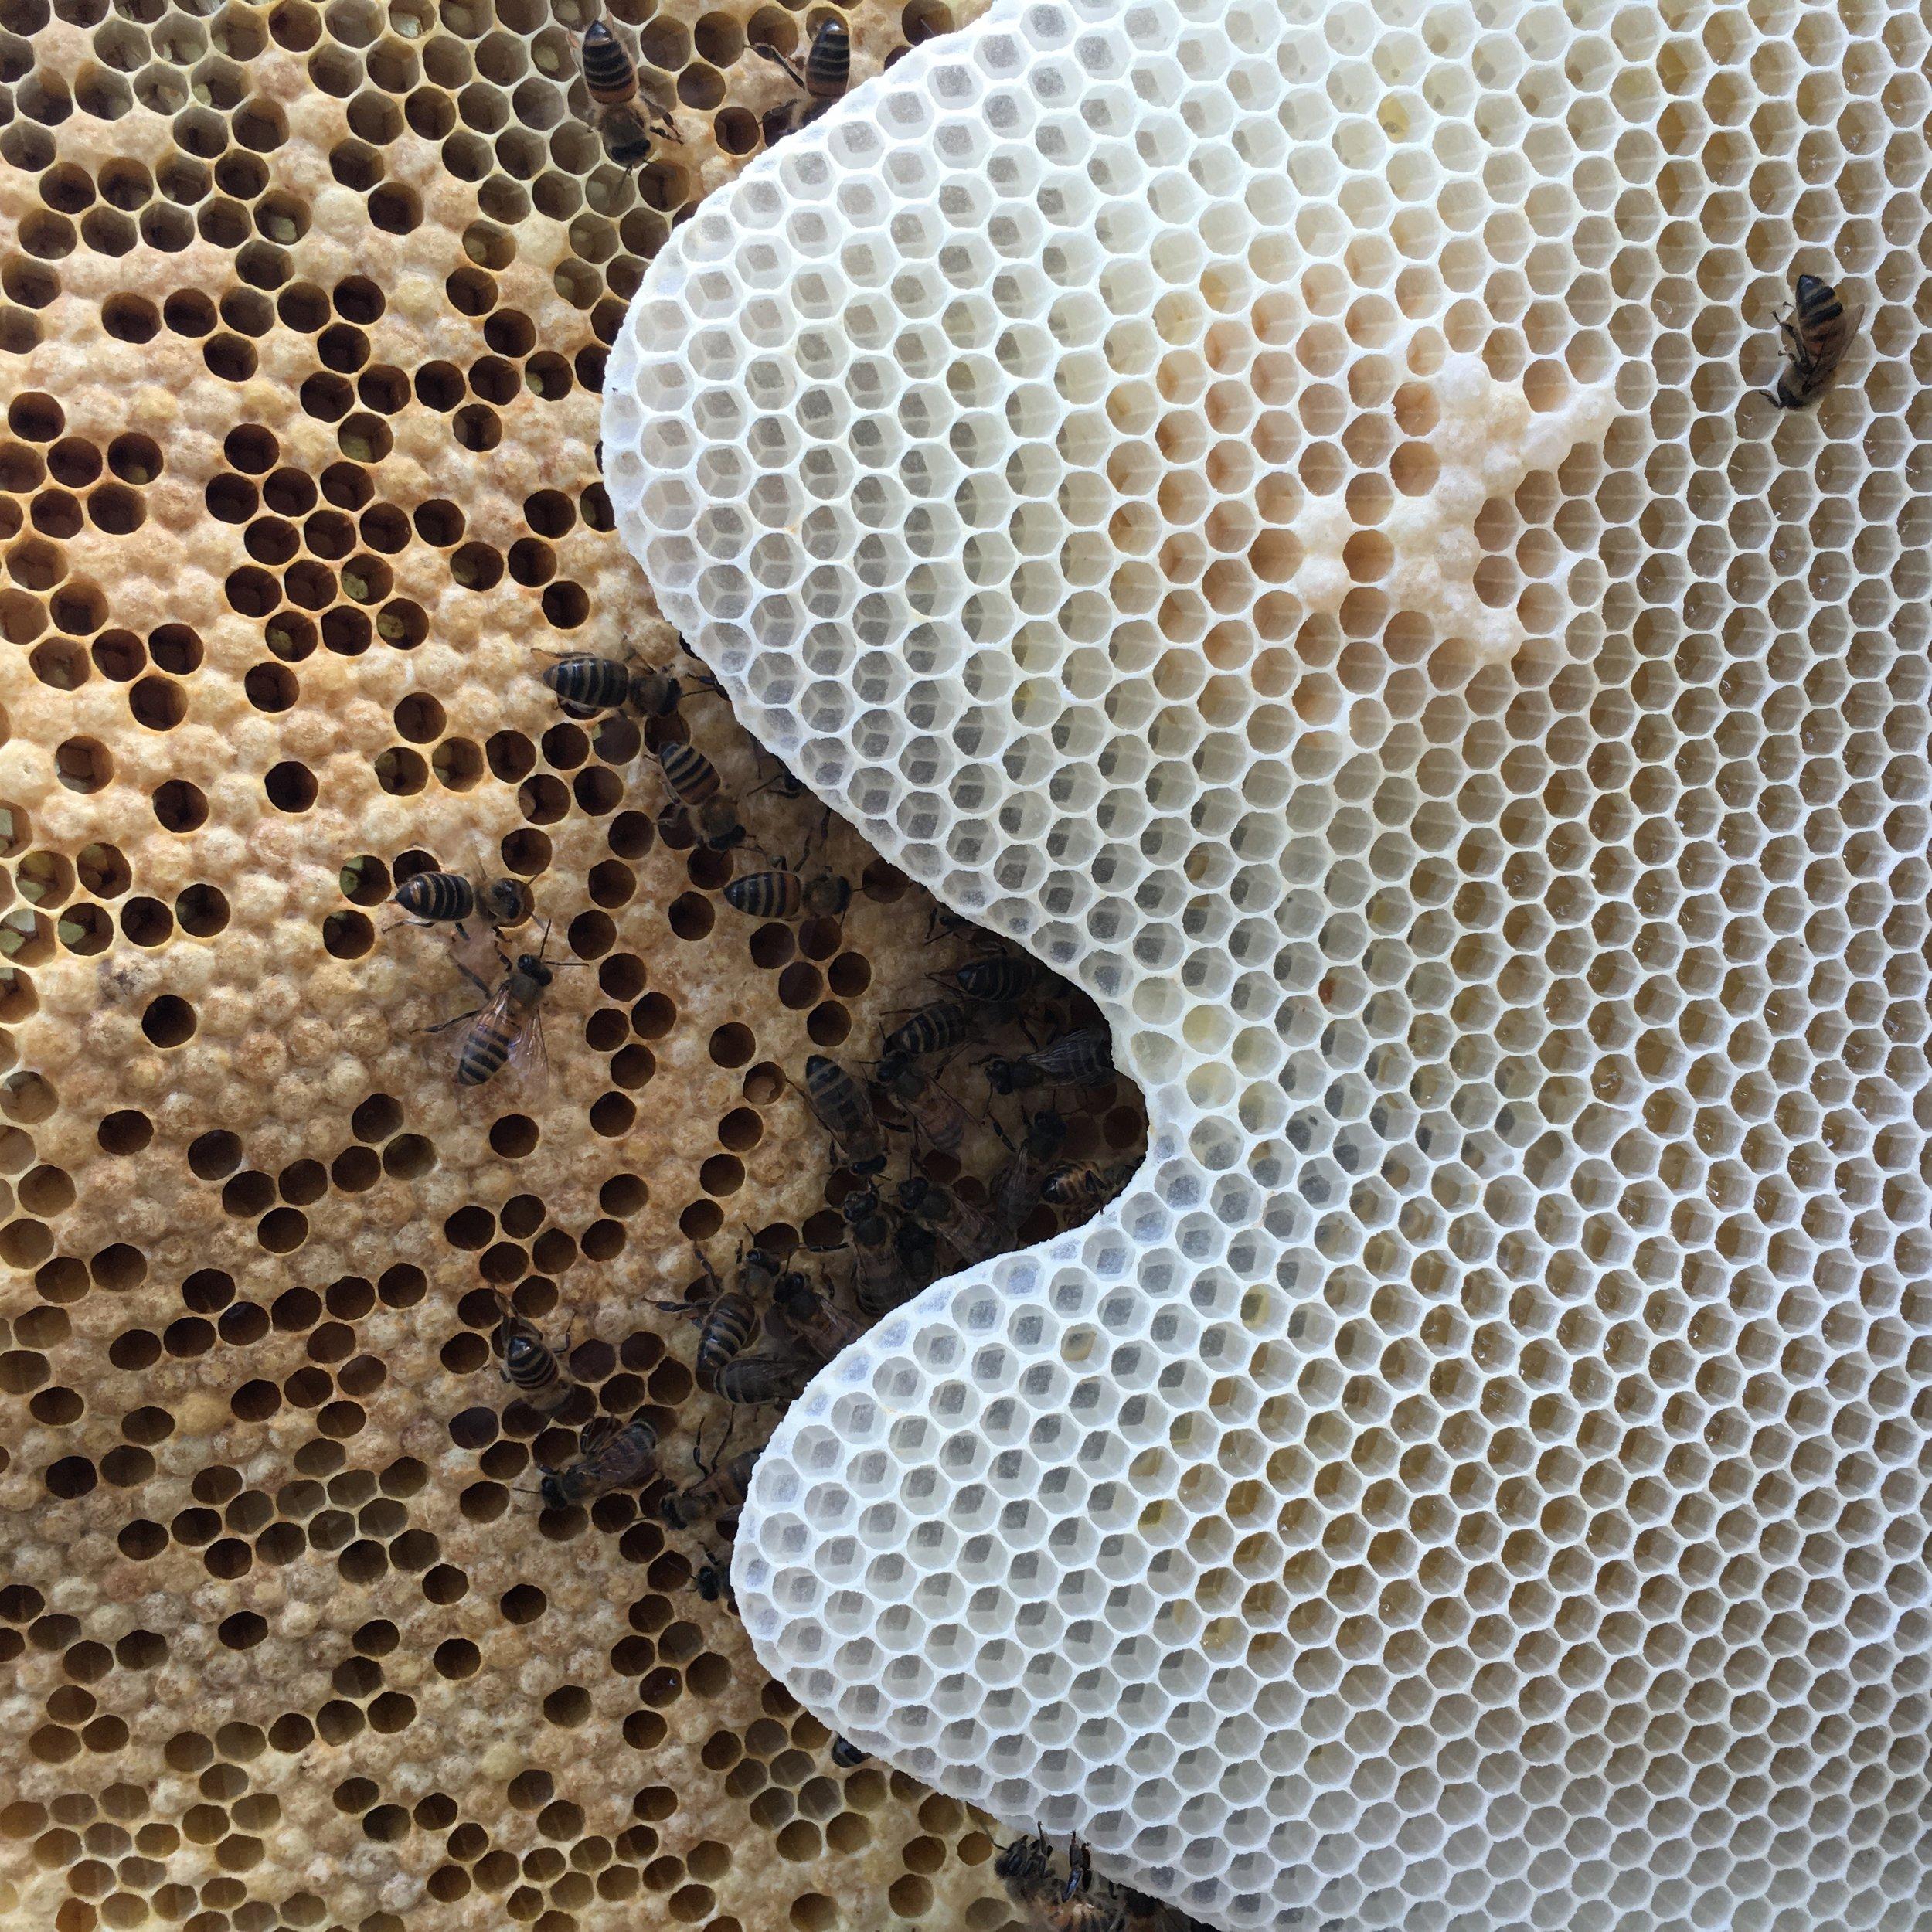 st_lucia_bees_fresh_honeycomb.jpg